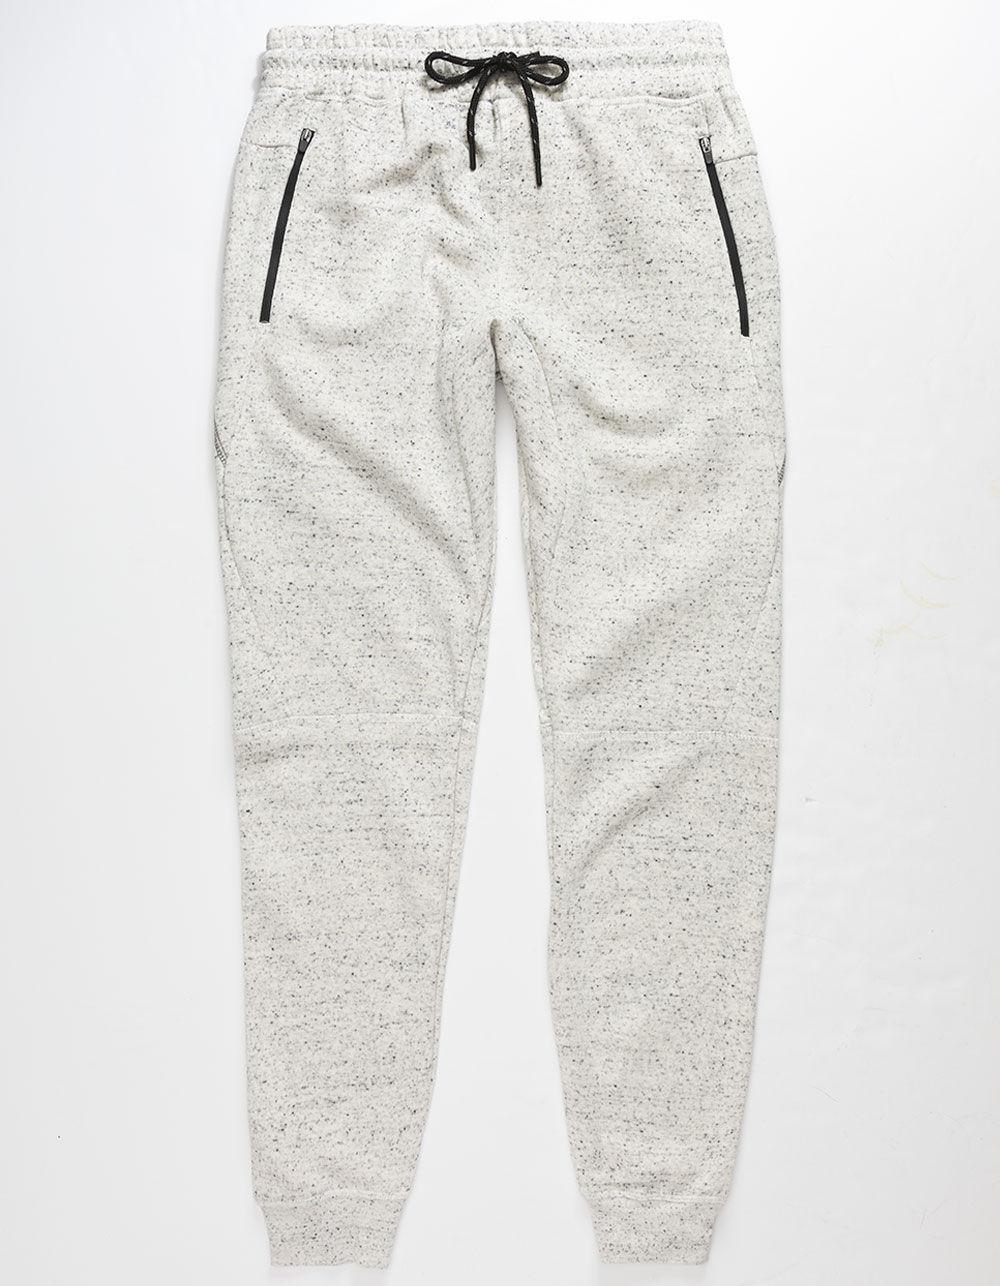 Image of BROOKLYN CLOTH NATURAL FLEECE JOGGER PANTS